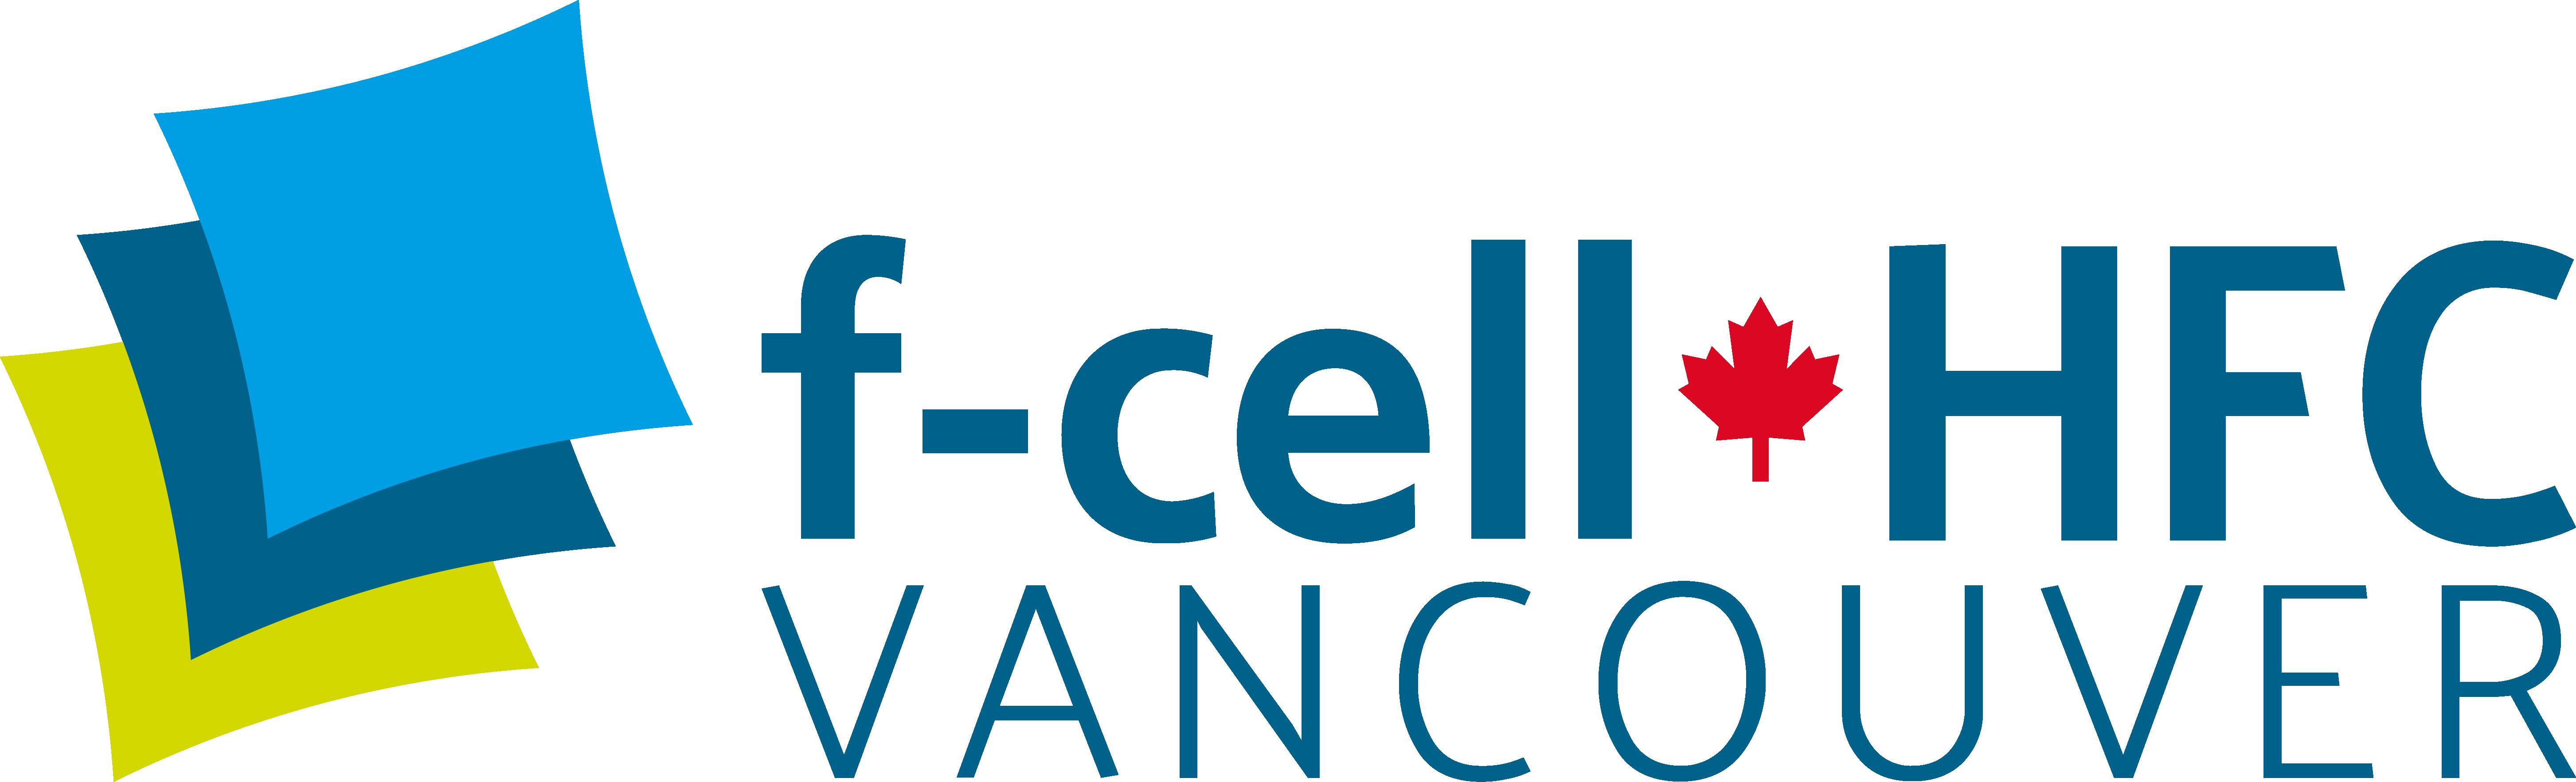 fcell hfc vancouver logo